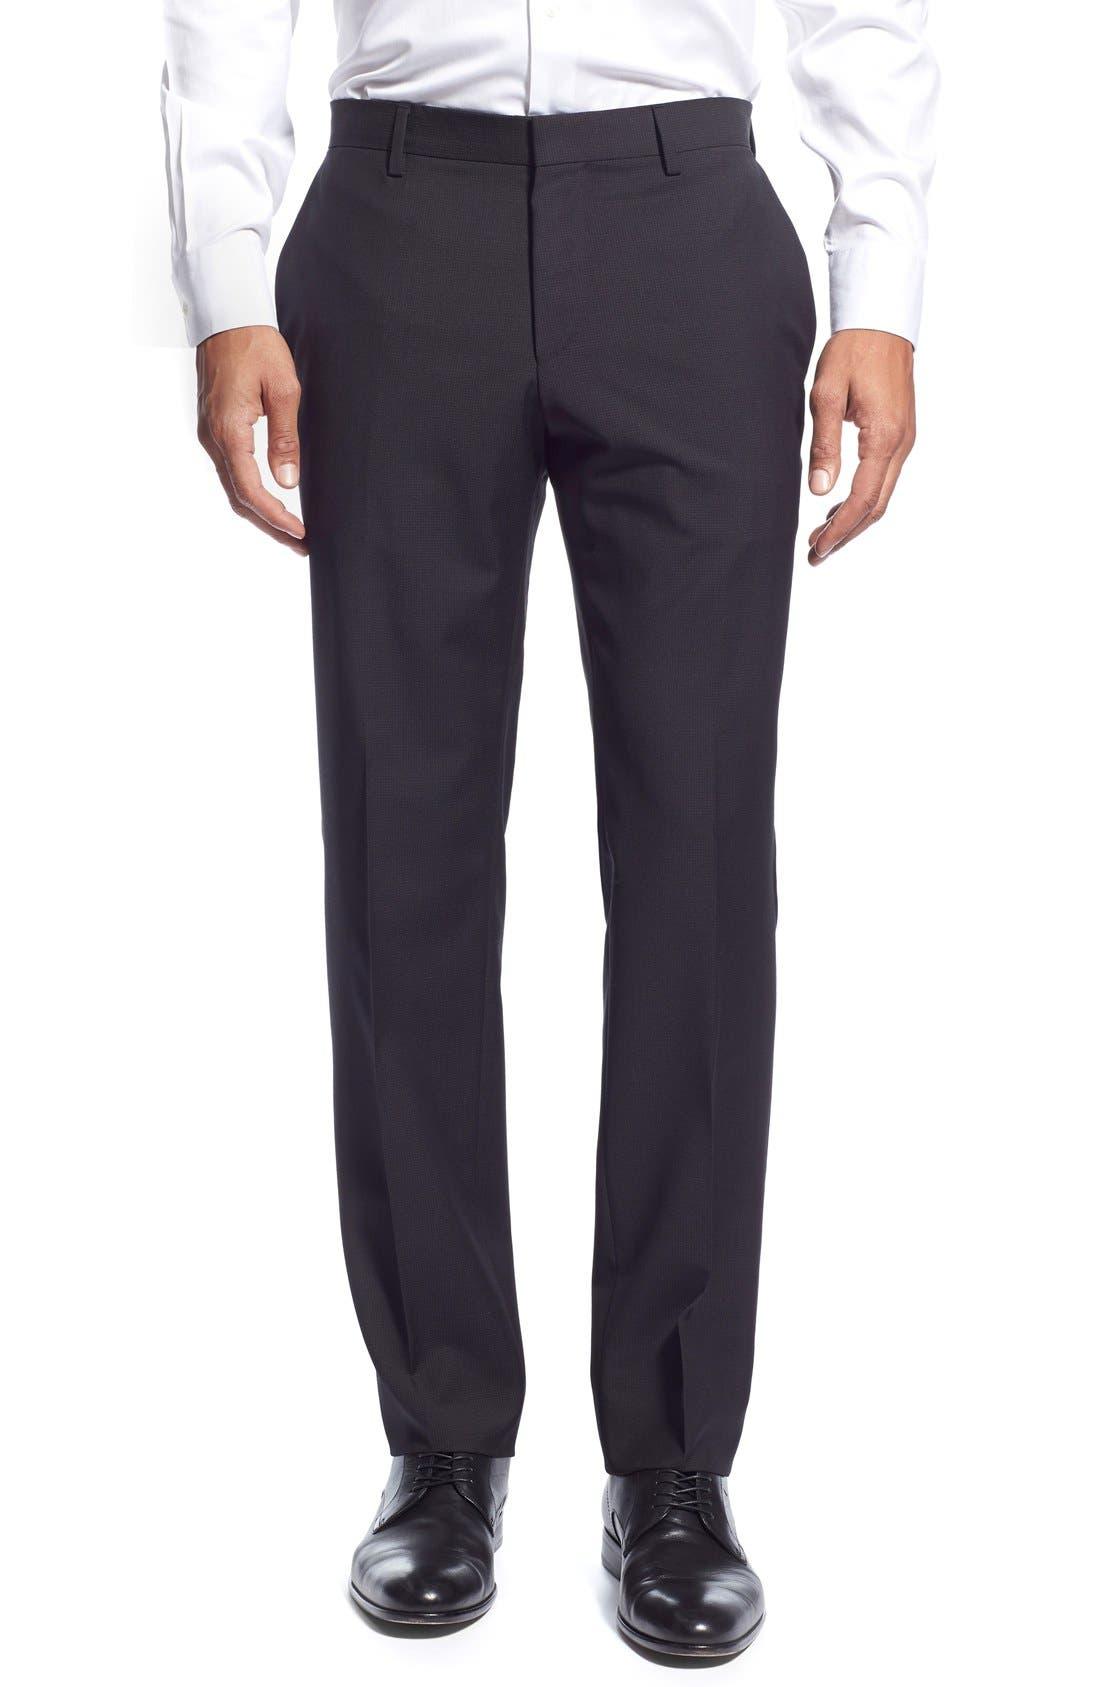 'Huge/Genius' Trim Fit Solid Wool Suit,                             Alternate thumbnail 15, color,                             BLACK